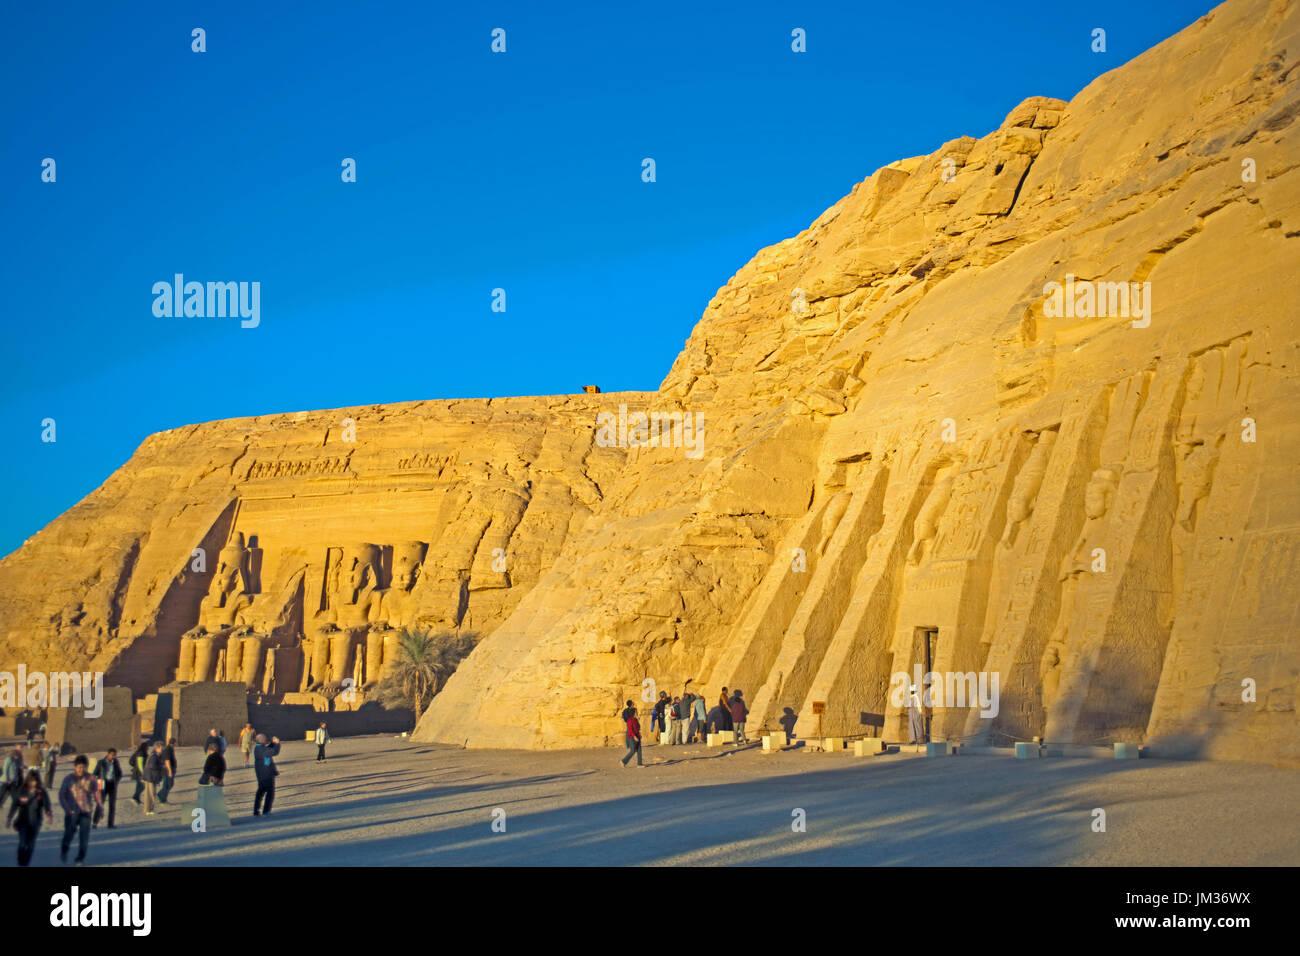 Aegypten, Abu Simbel, Hathortempel der Nefertari, der Lieblingsfrau von Ramses II., links dahinter der Grosse Tempel des Ramses II. - Stock Image